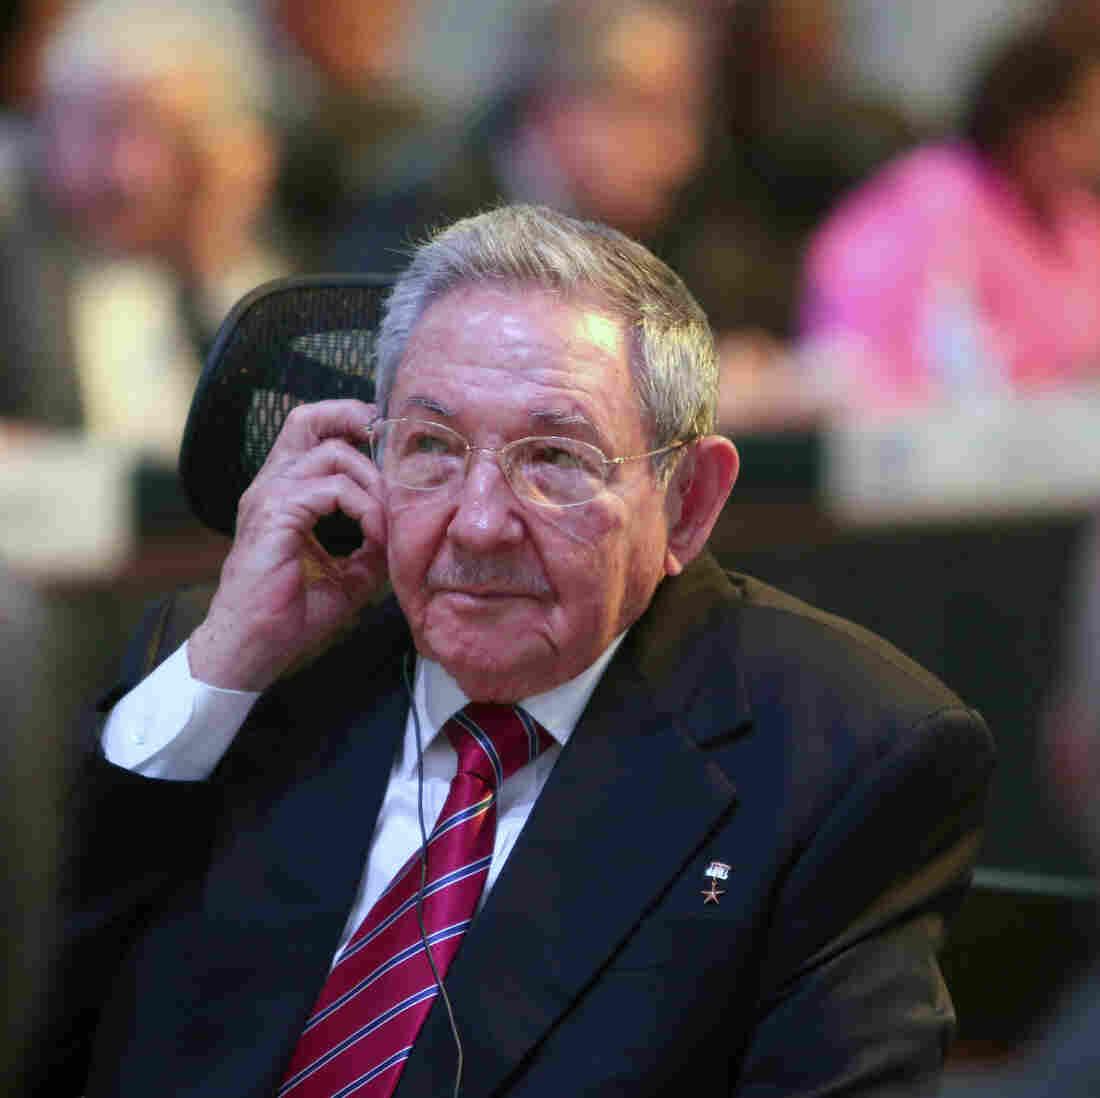 Raúl Castro Demands Return Of Guantánamo Before Normalizing Ties With U.S.